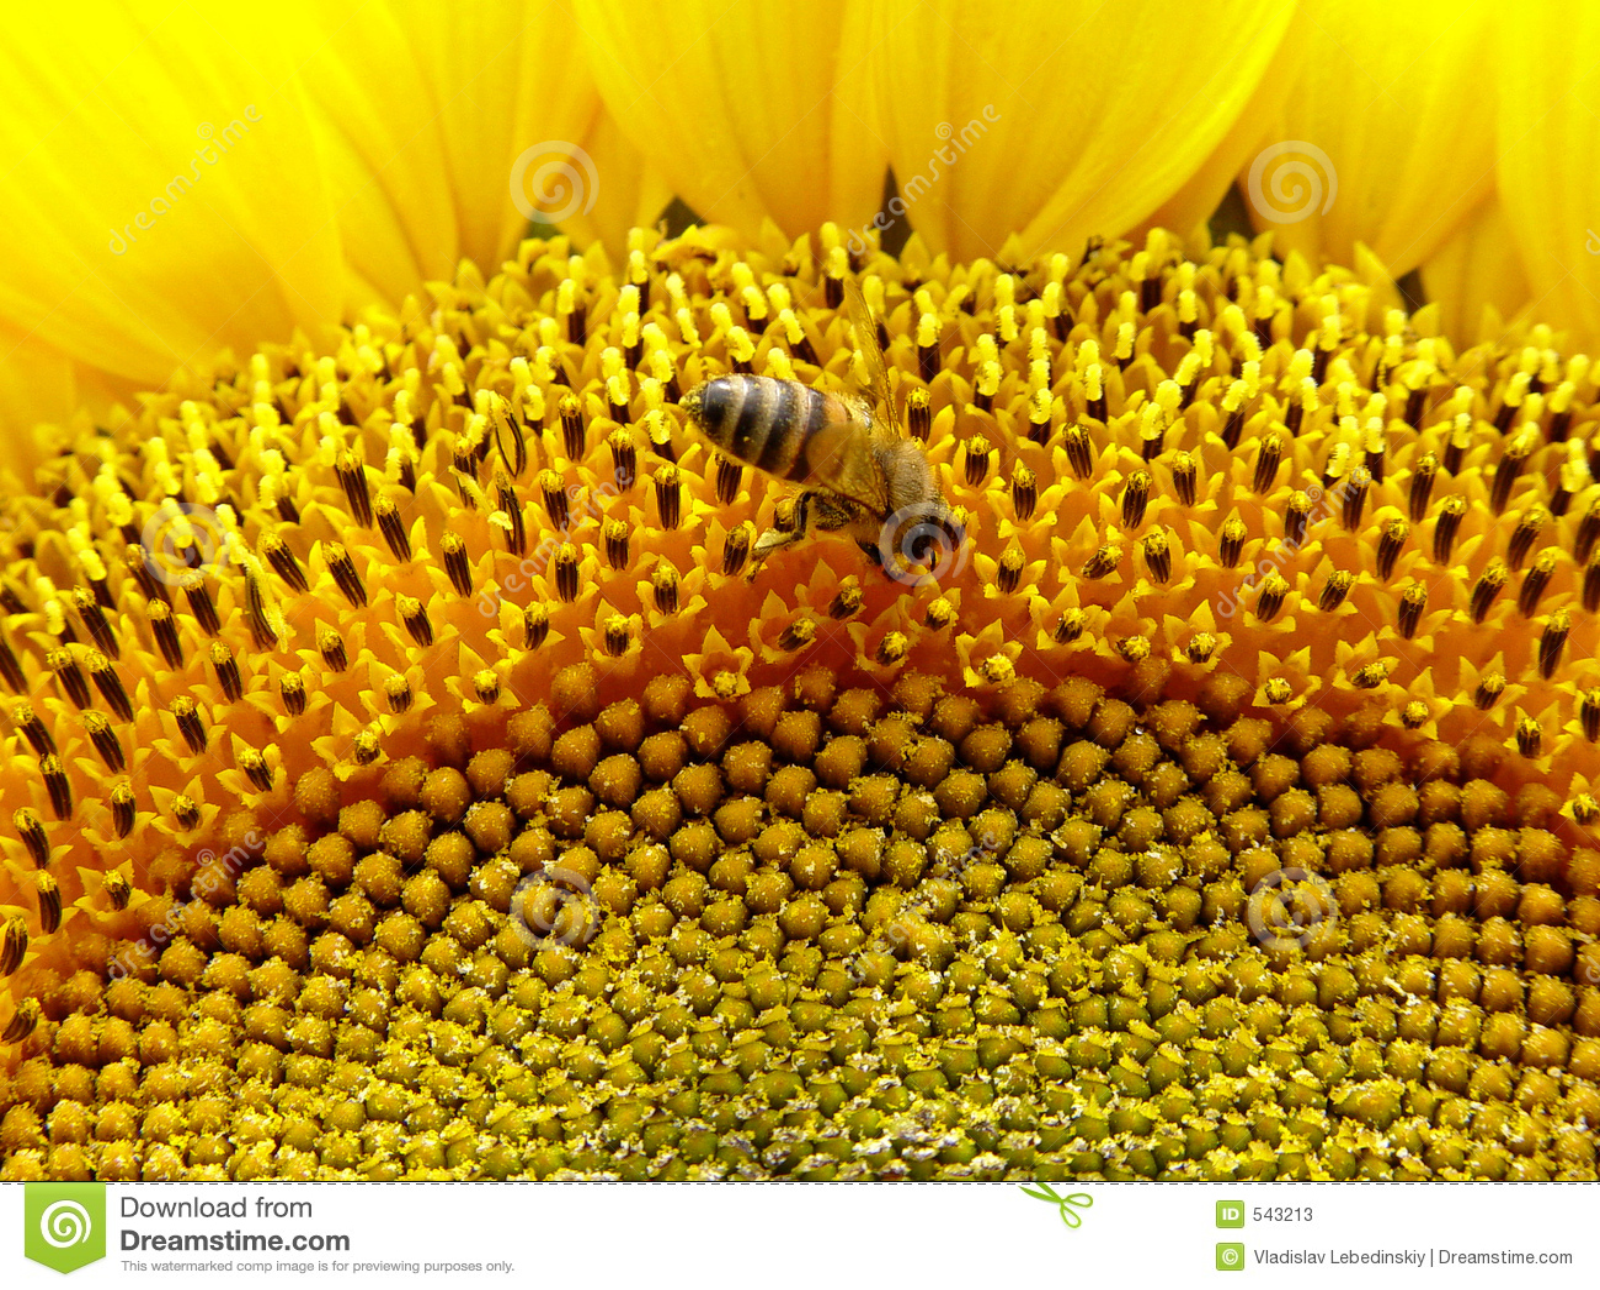 Download 蜂向日葵 库存图片. 图片 包括有 收获, 查找, 飞行, 寻呼机, 相当, 速度, 英俊, 饱和, 收集, 绽放 - 543213